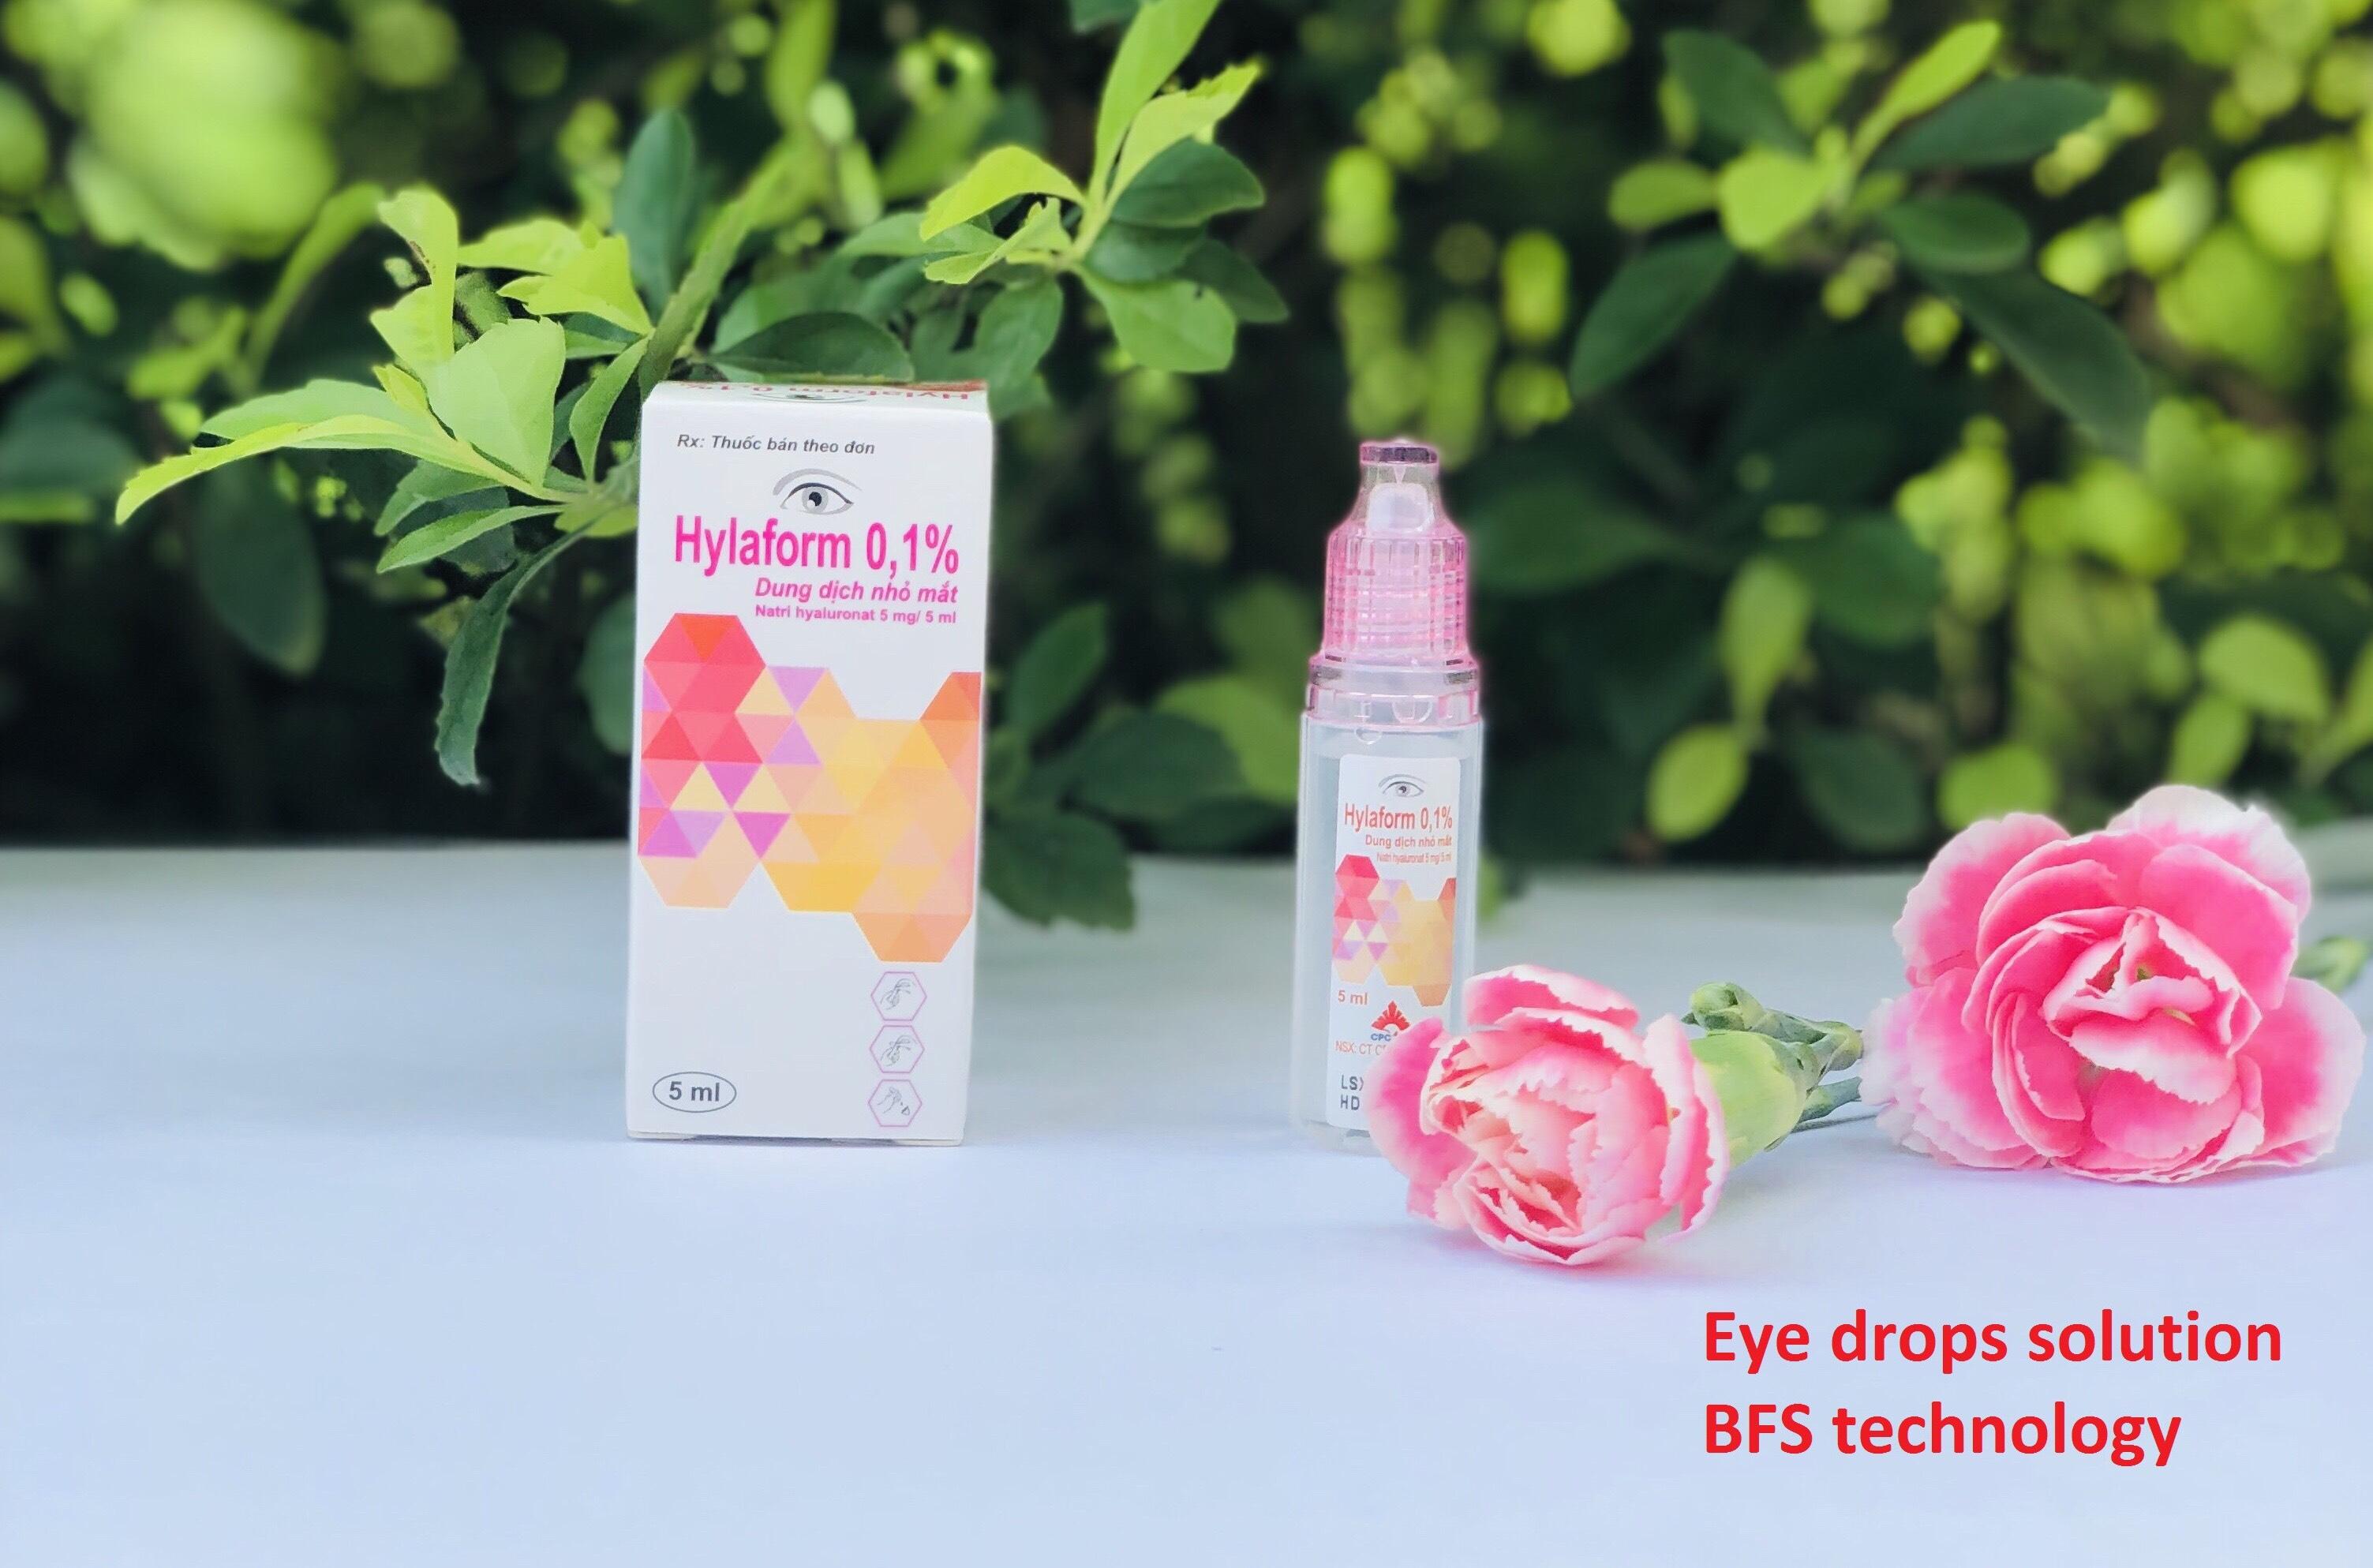 Multidose Ophthalmic Sodium hyaluronate 1 mg/ml